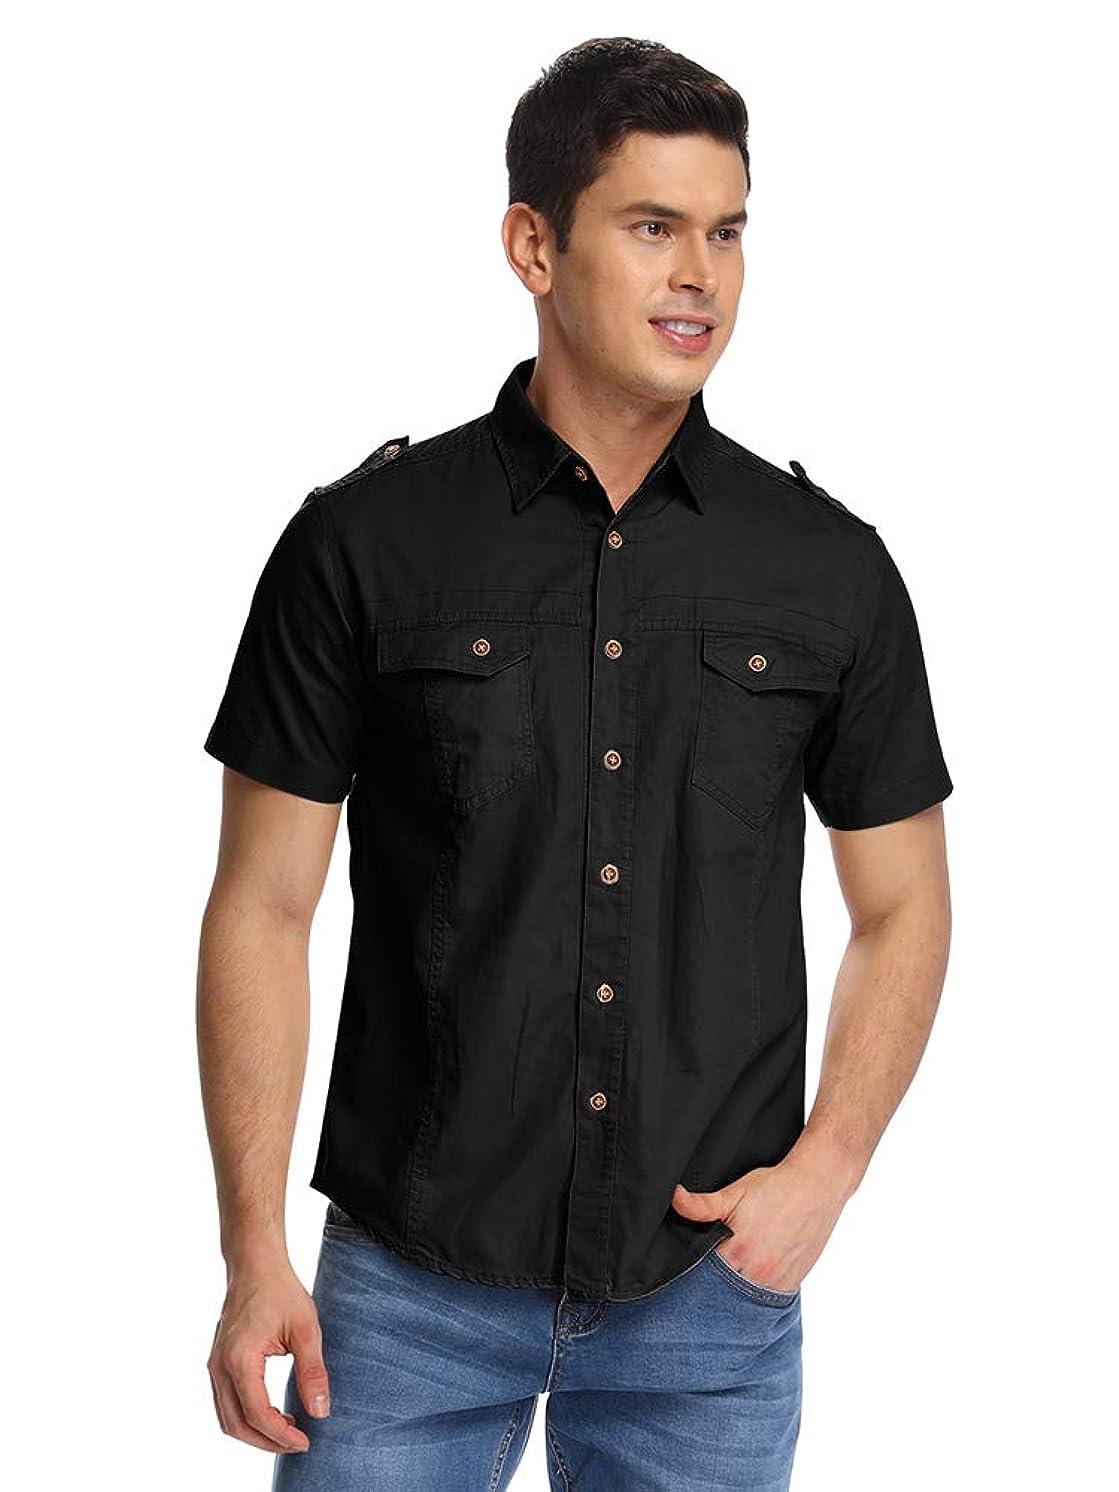 Mesinsefra Men's Cotton Solid Short Sleeve Military Button Down Shirts